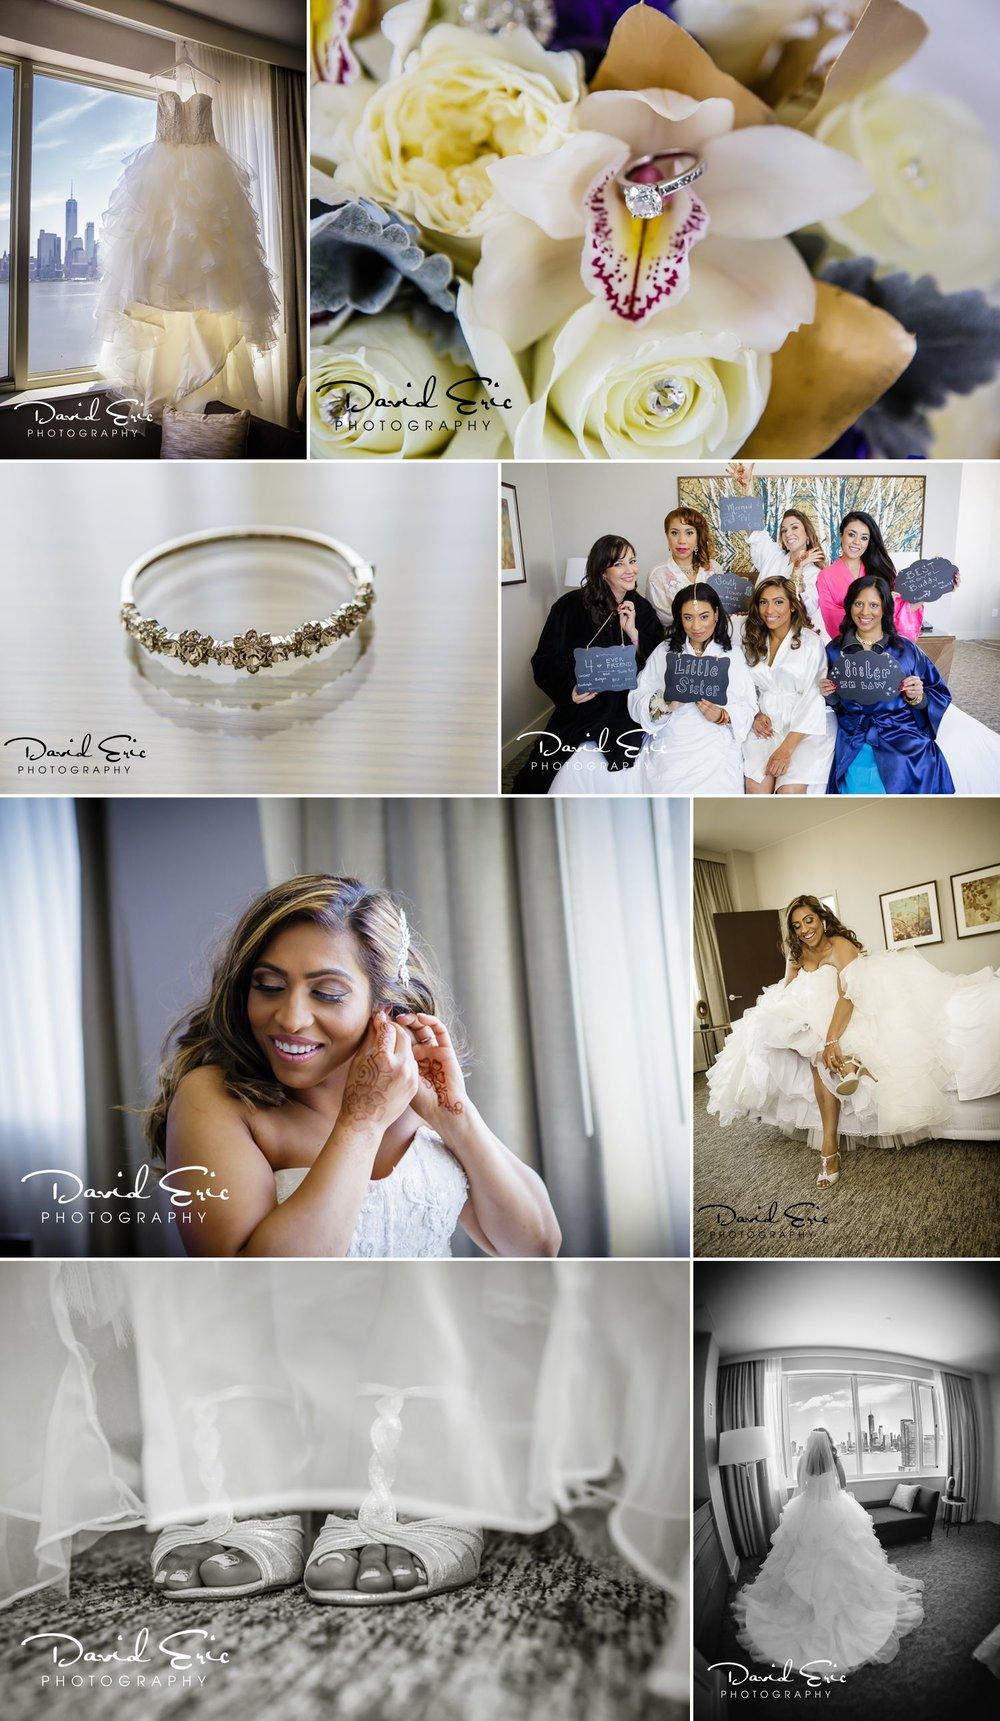 bergen_county_new_jersey_Battello_Jersey_City_wedding_0033.jpg